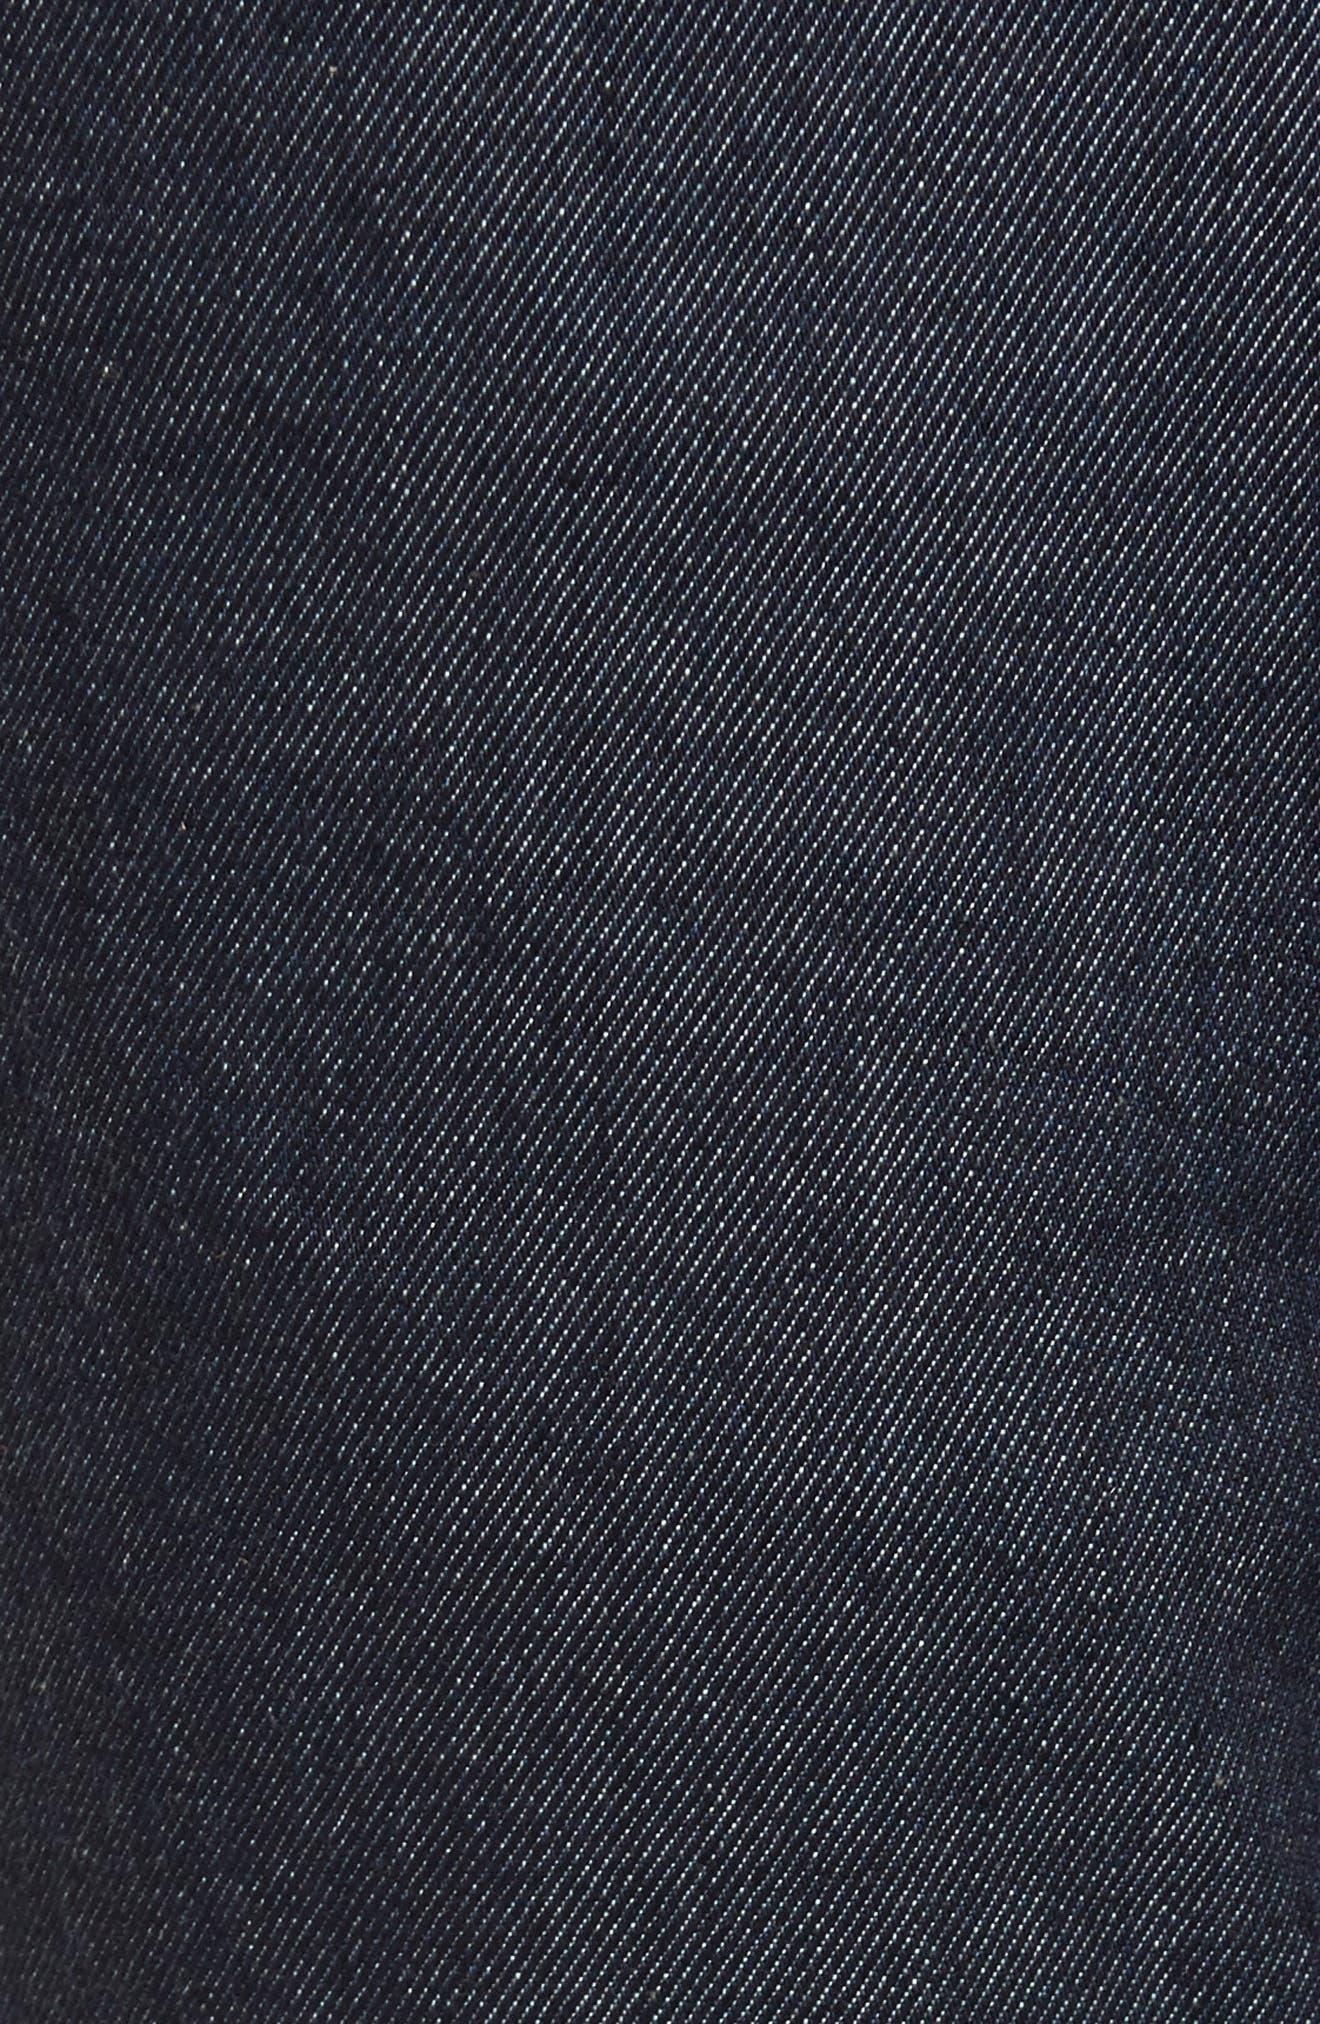 Vantage Skinny Fit Jeans,                             Alternate thumbnail 6, color,